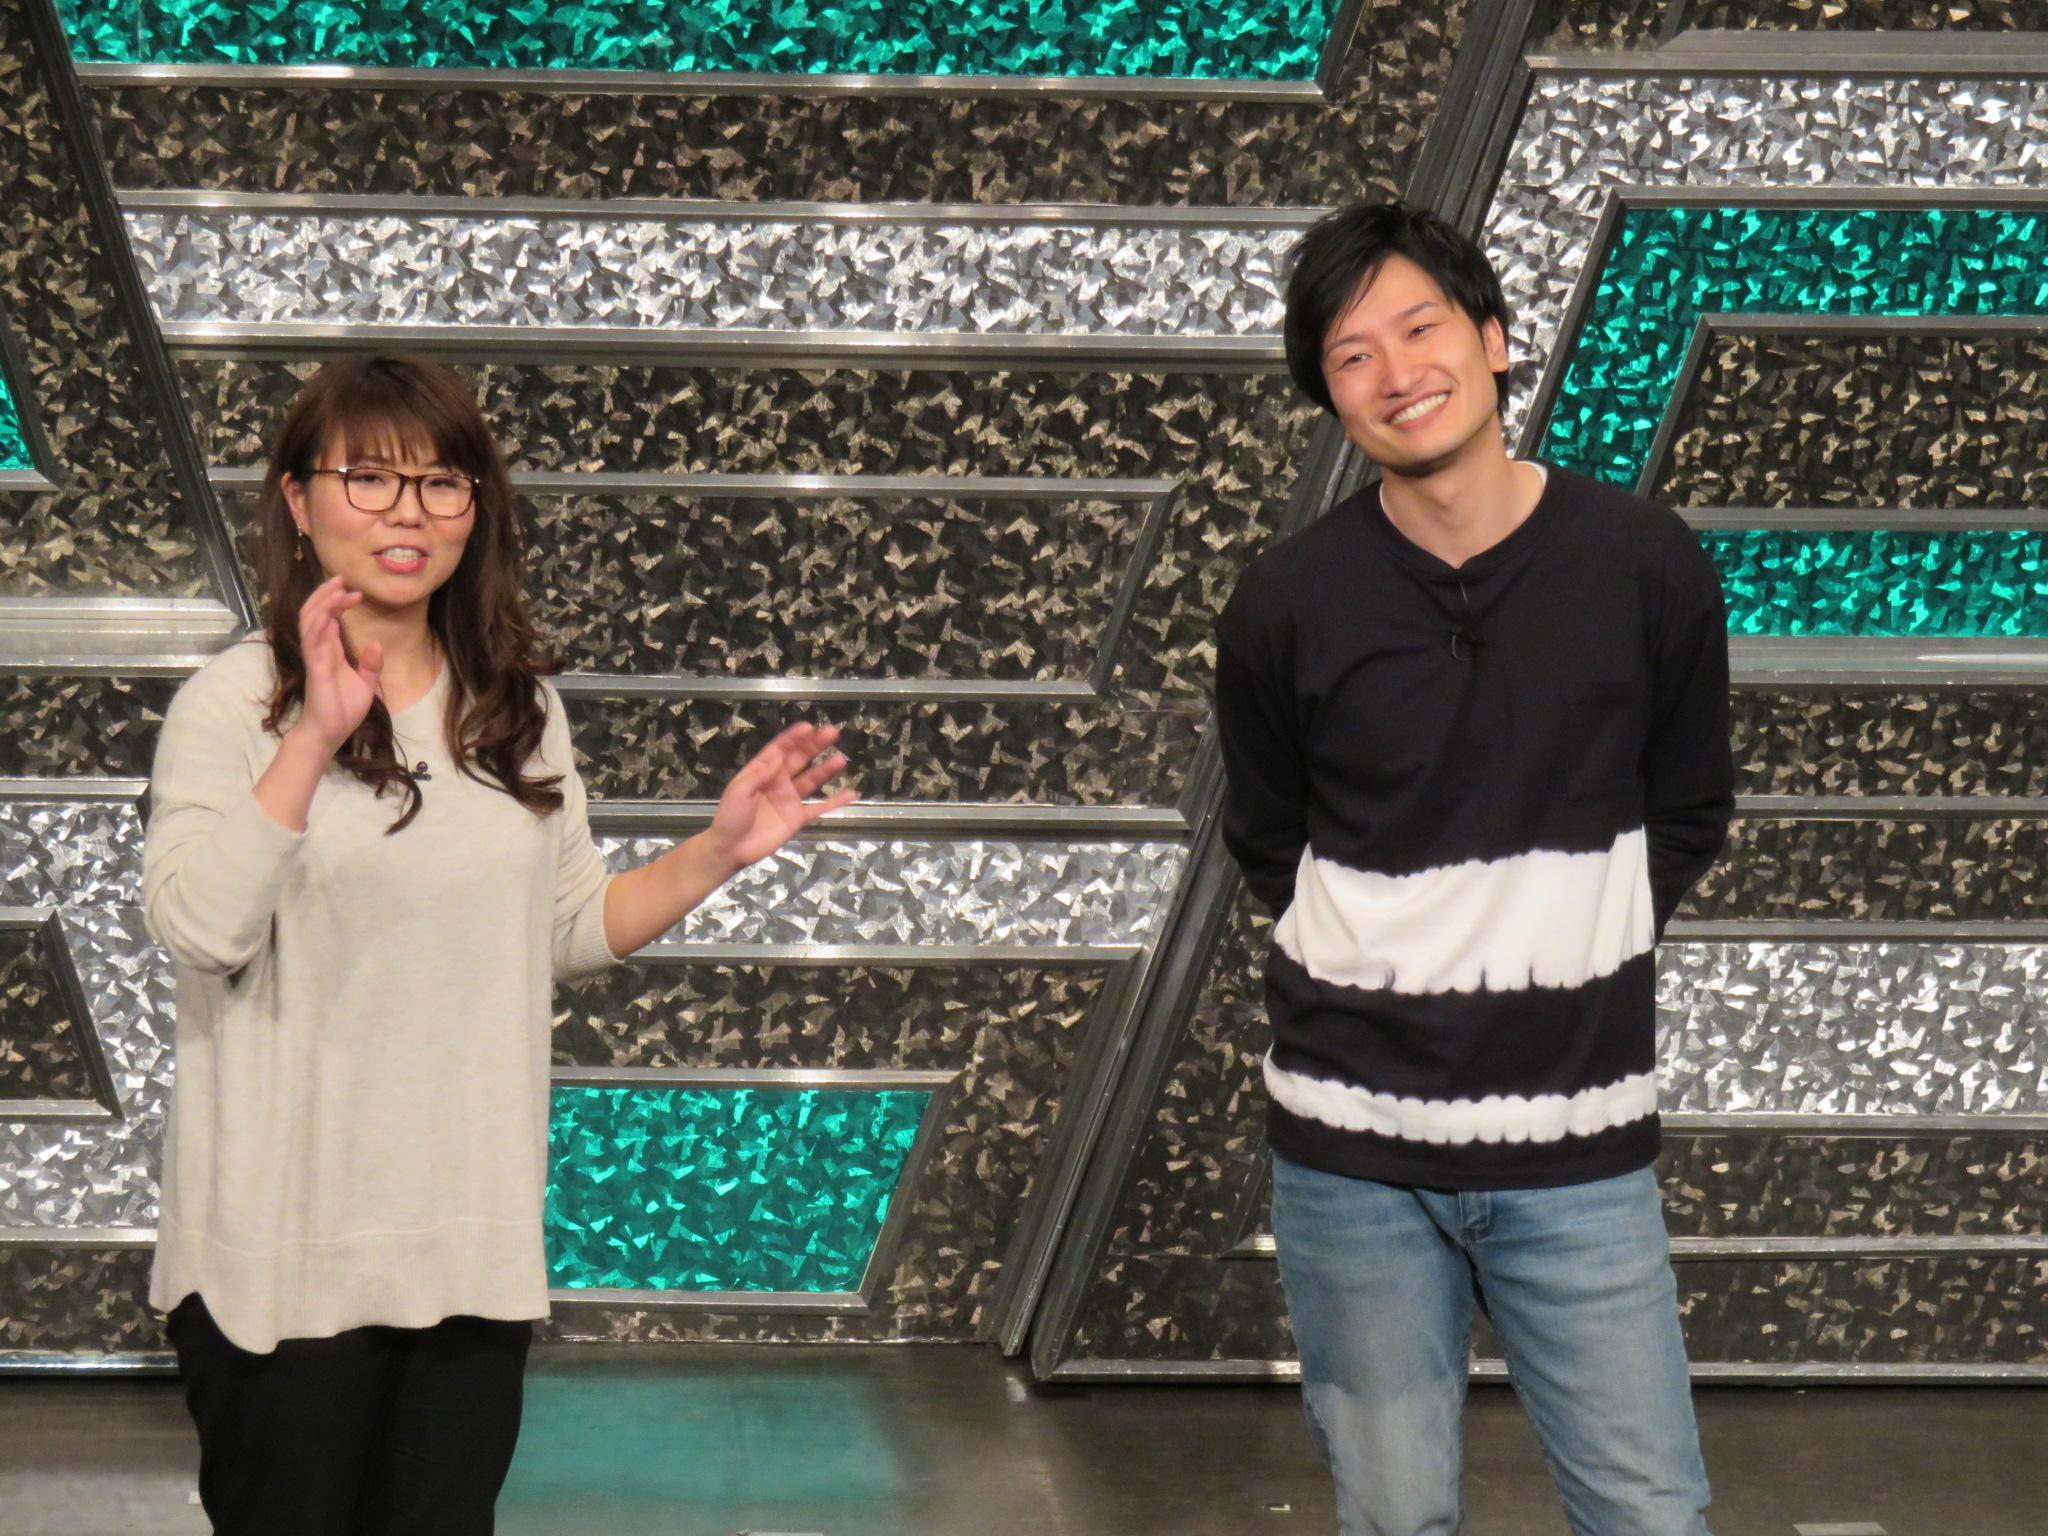 http://news.yoshimoto.co.jp/20170331201127-eddaa551beae900ef5bb0ca07a6e60ce09518333.jpg